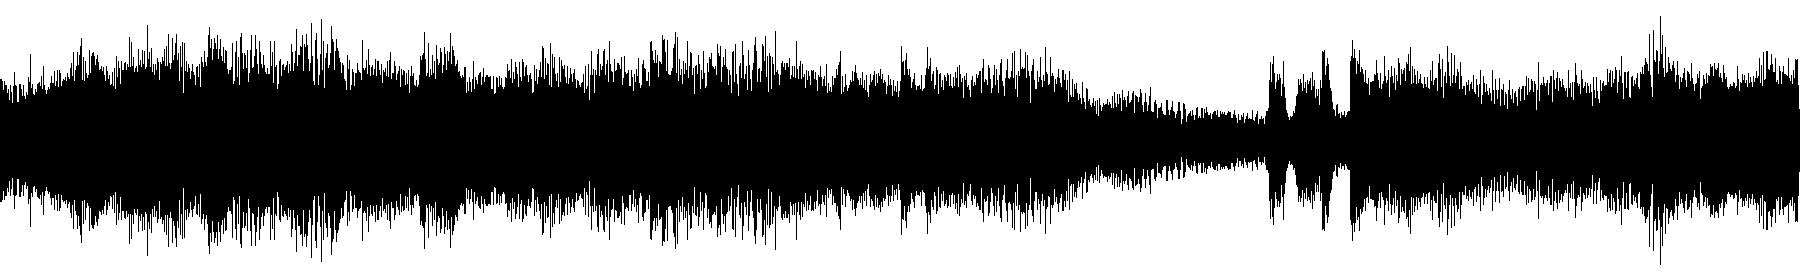 vedh melodyloop 061 gm7 9 dm7 9 fm7 9 cm7 9 120bpm